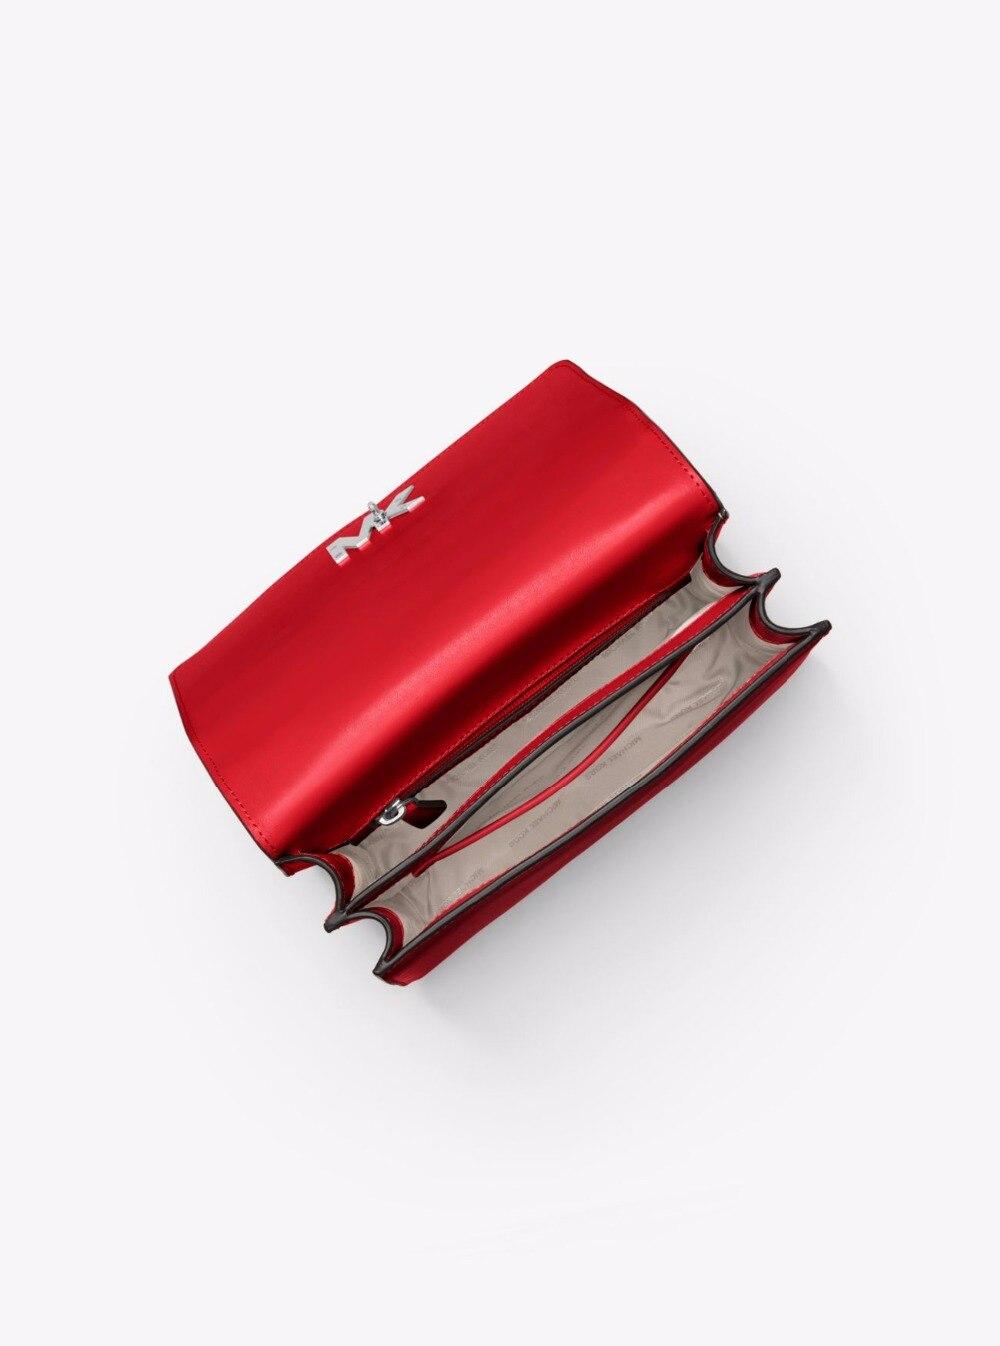 3c3ff58f4f38 FSO- Michael Kors Official MK Women Bag Whitney Leather Shoulder Bag ...